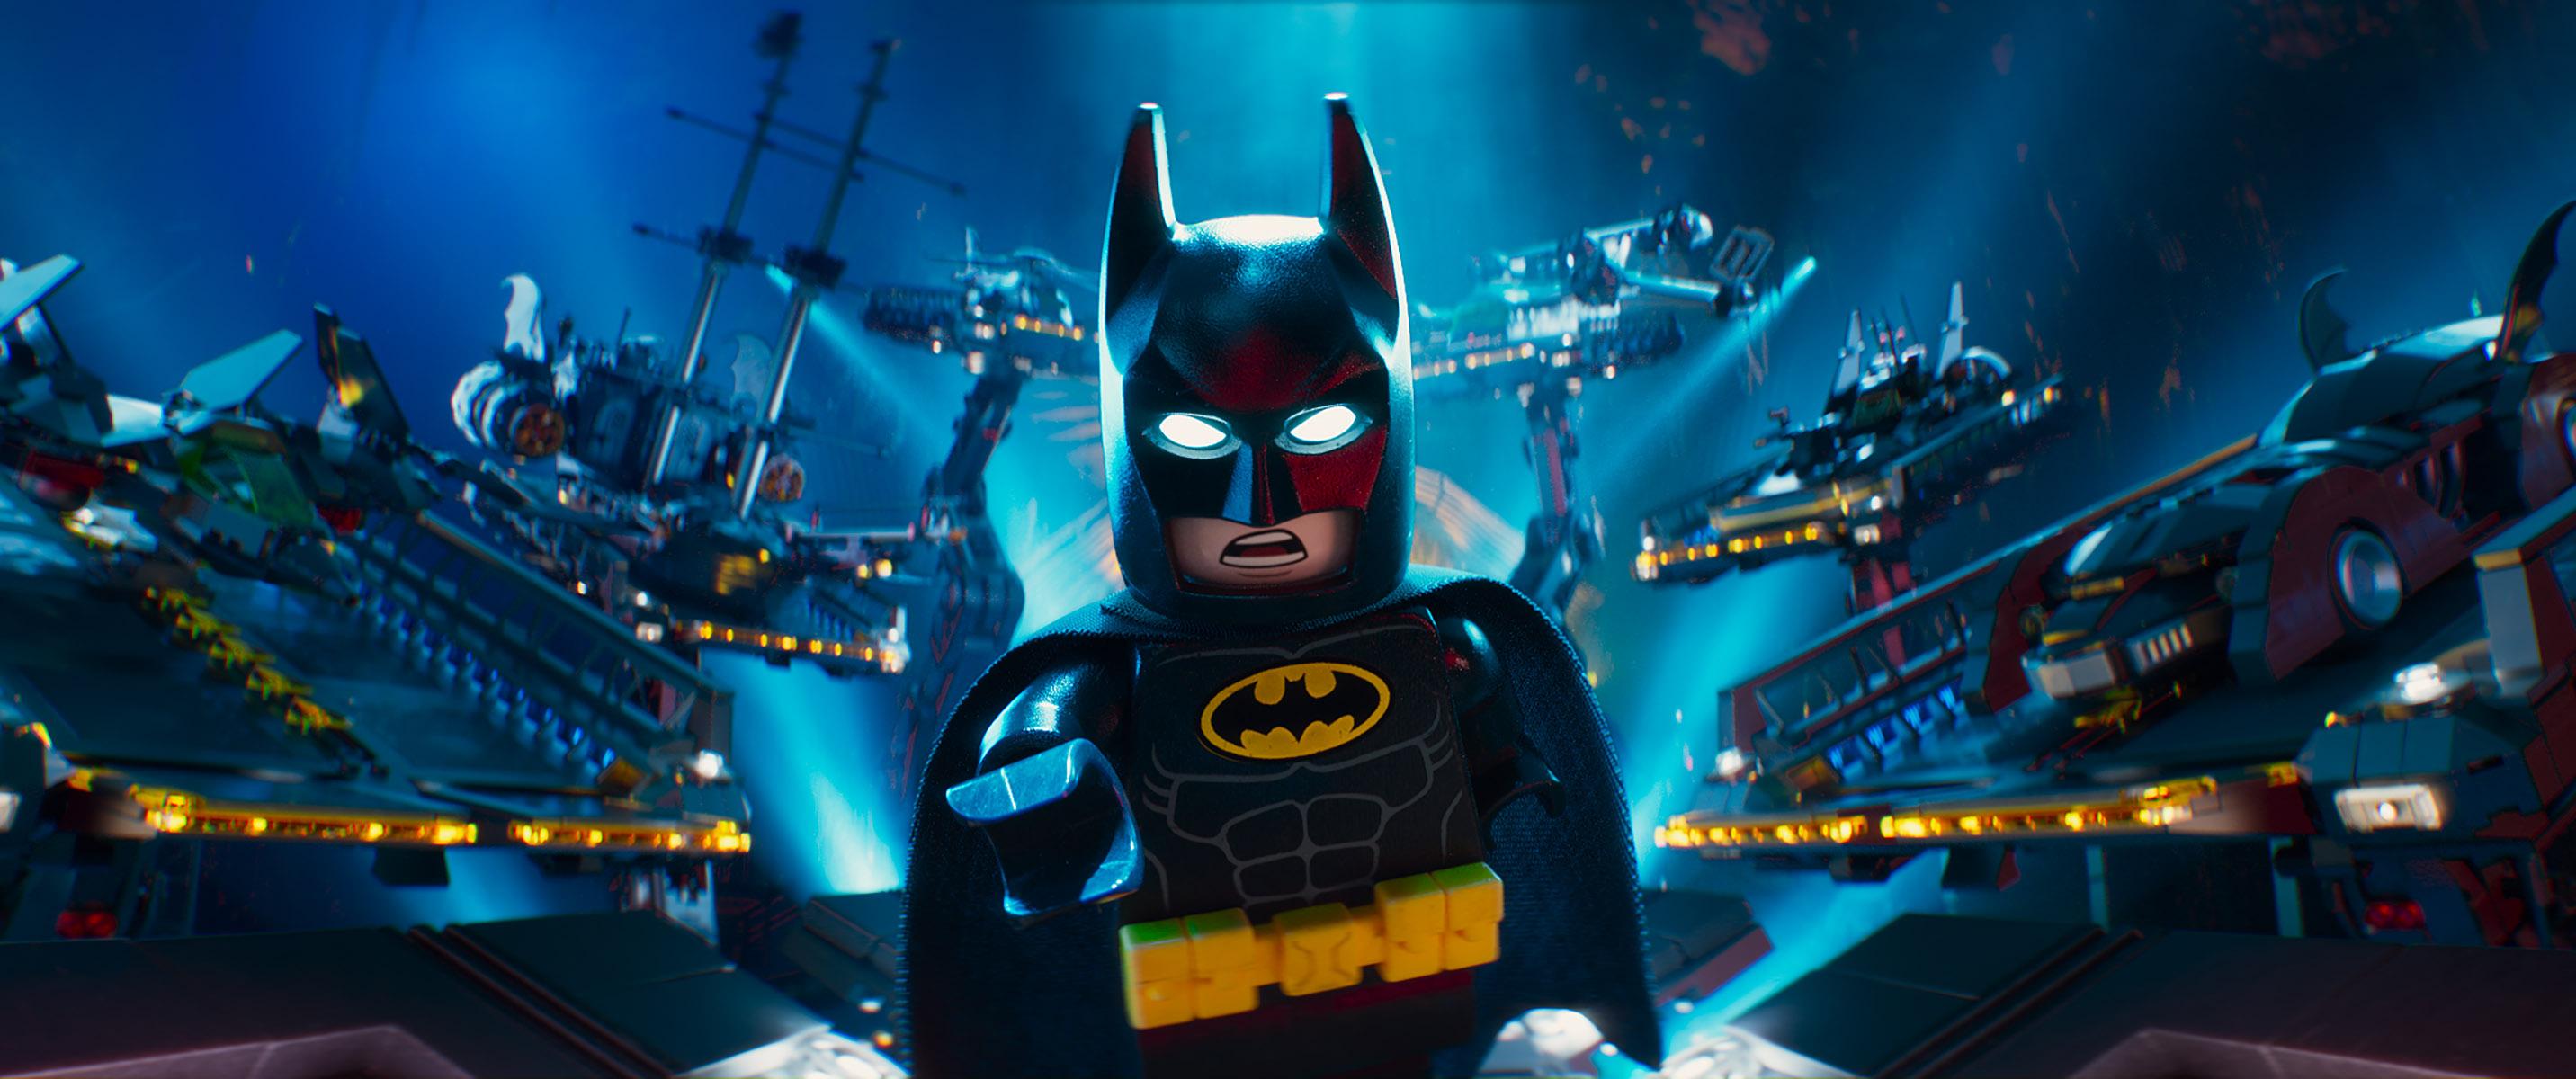 Бэтмен в фильме Лего Фильм: Бэтмен